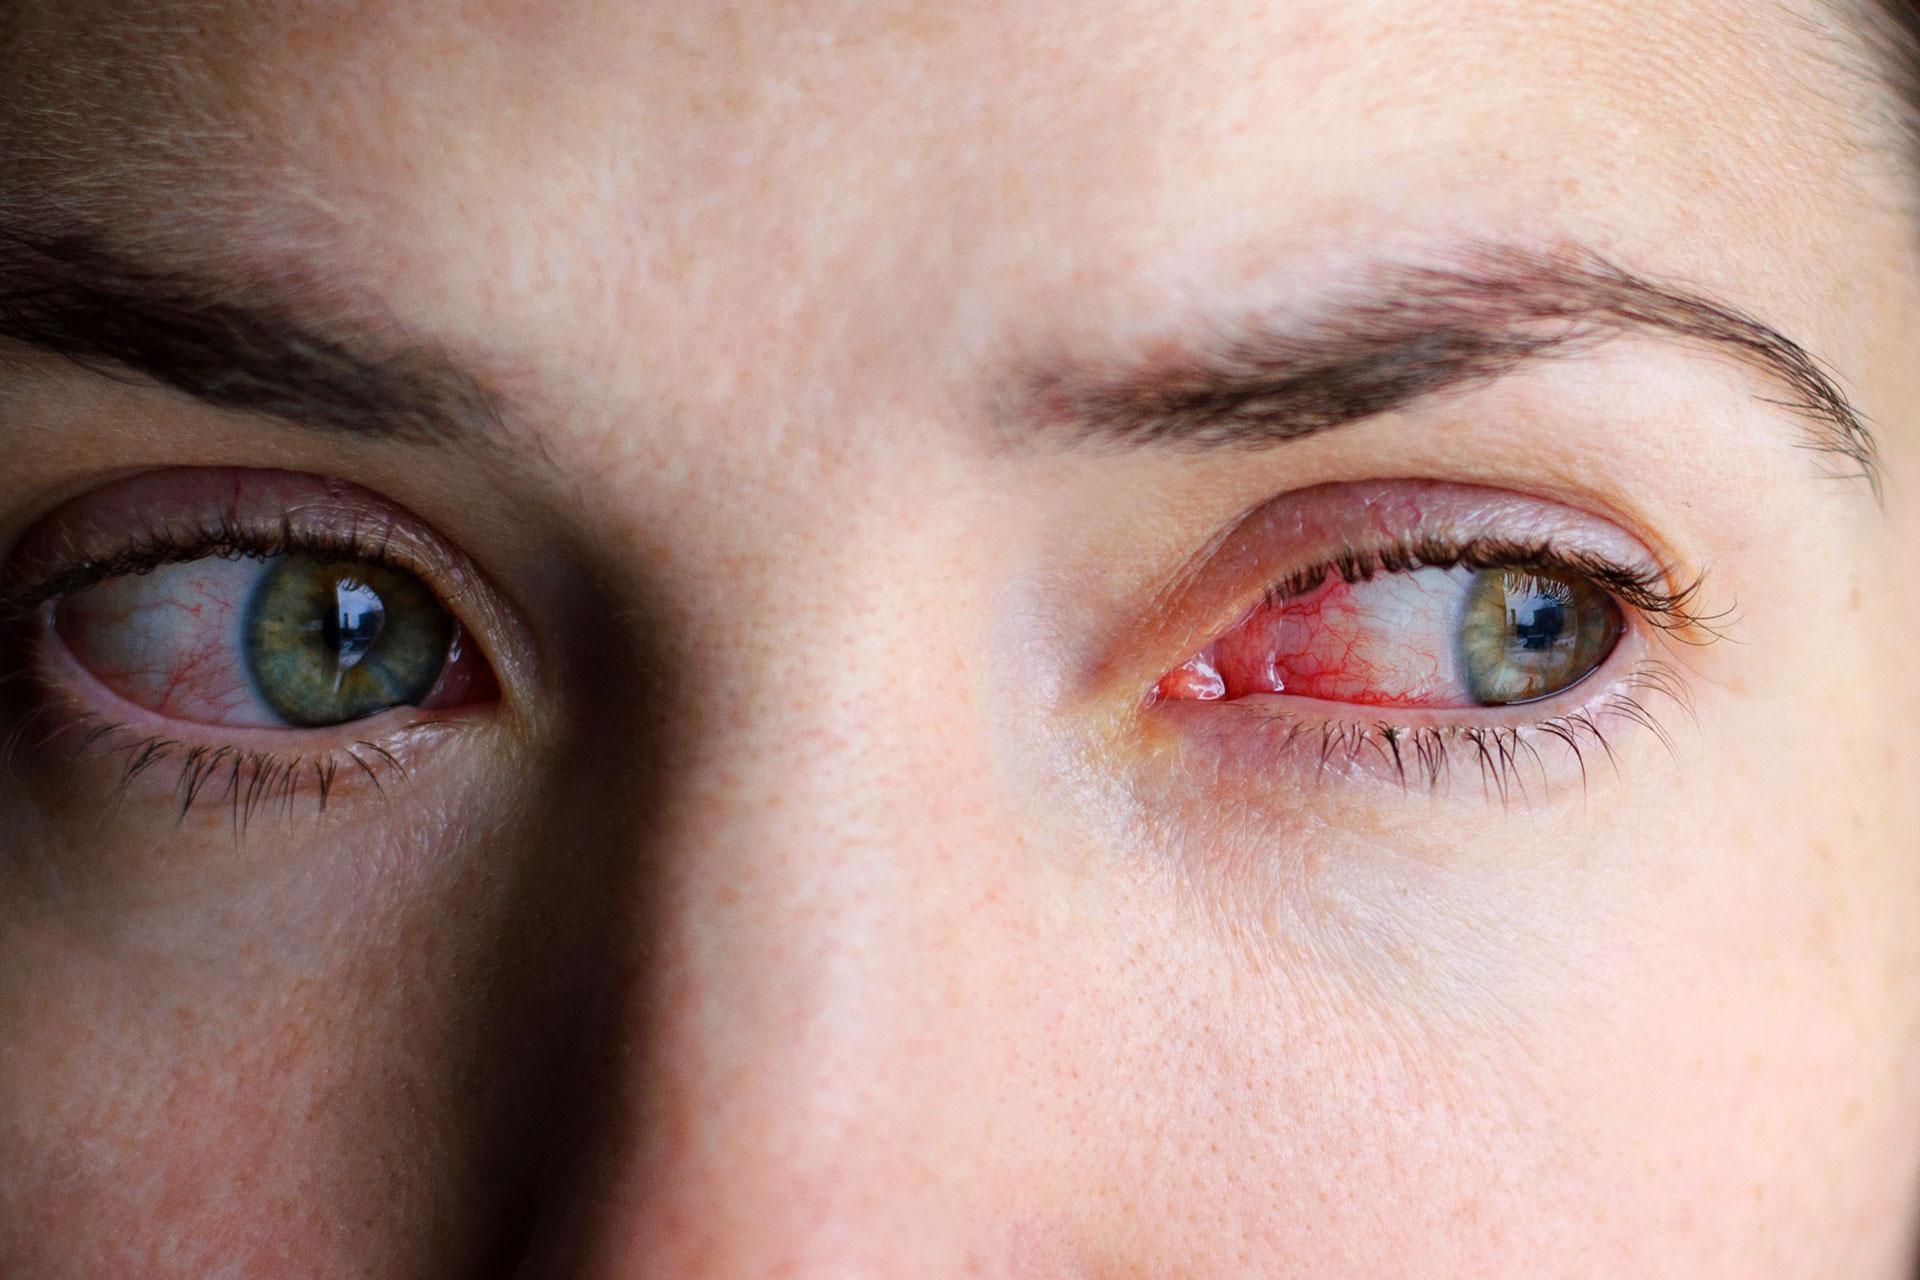 Swollen Eyes Dark Circles Red And Burning Eyes